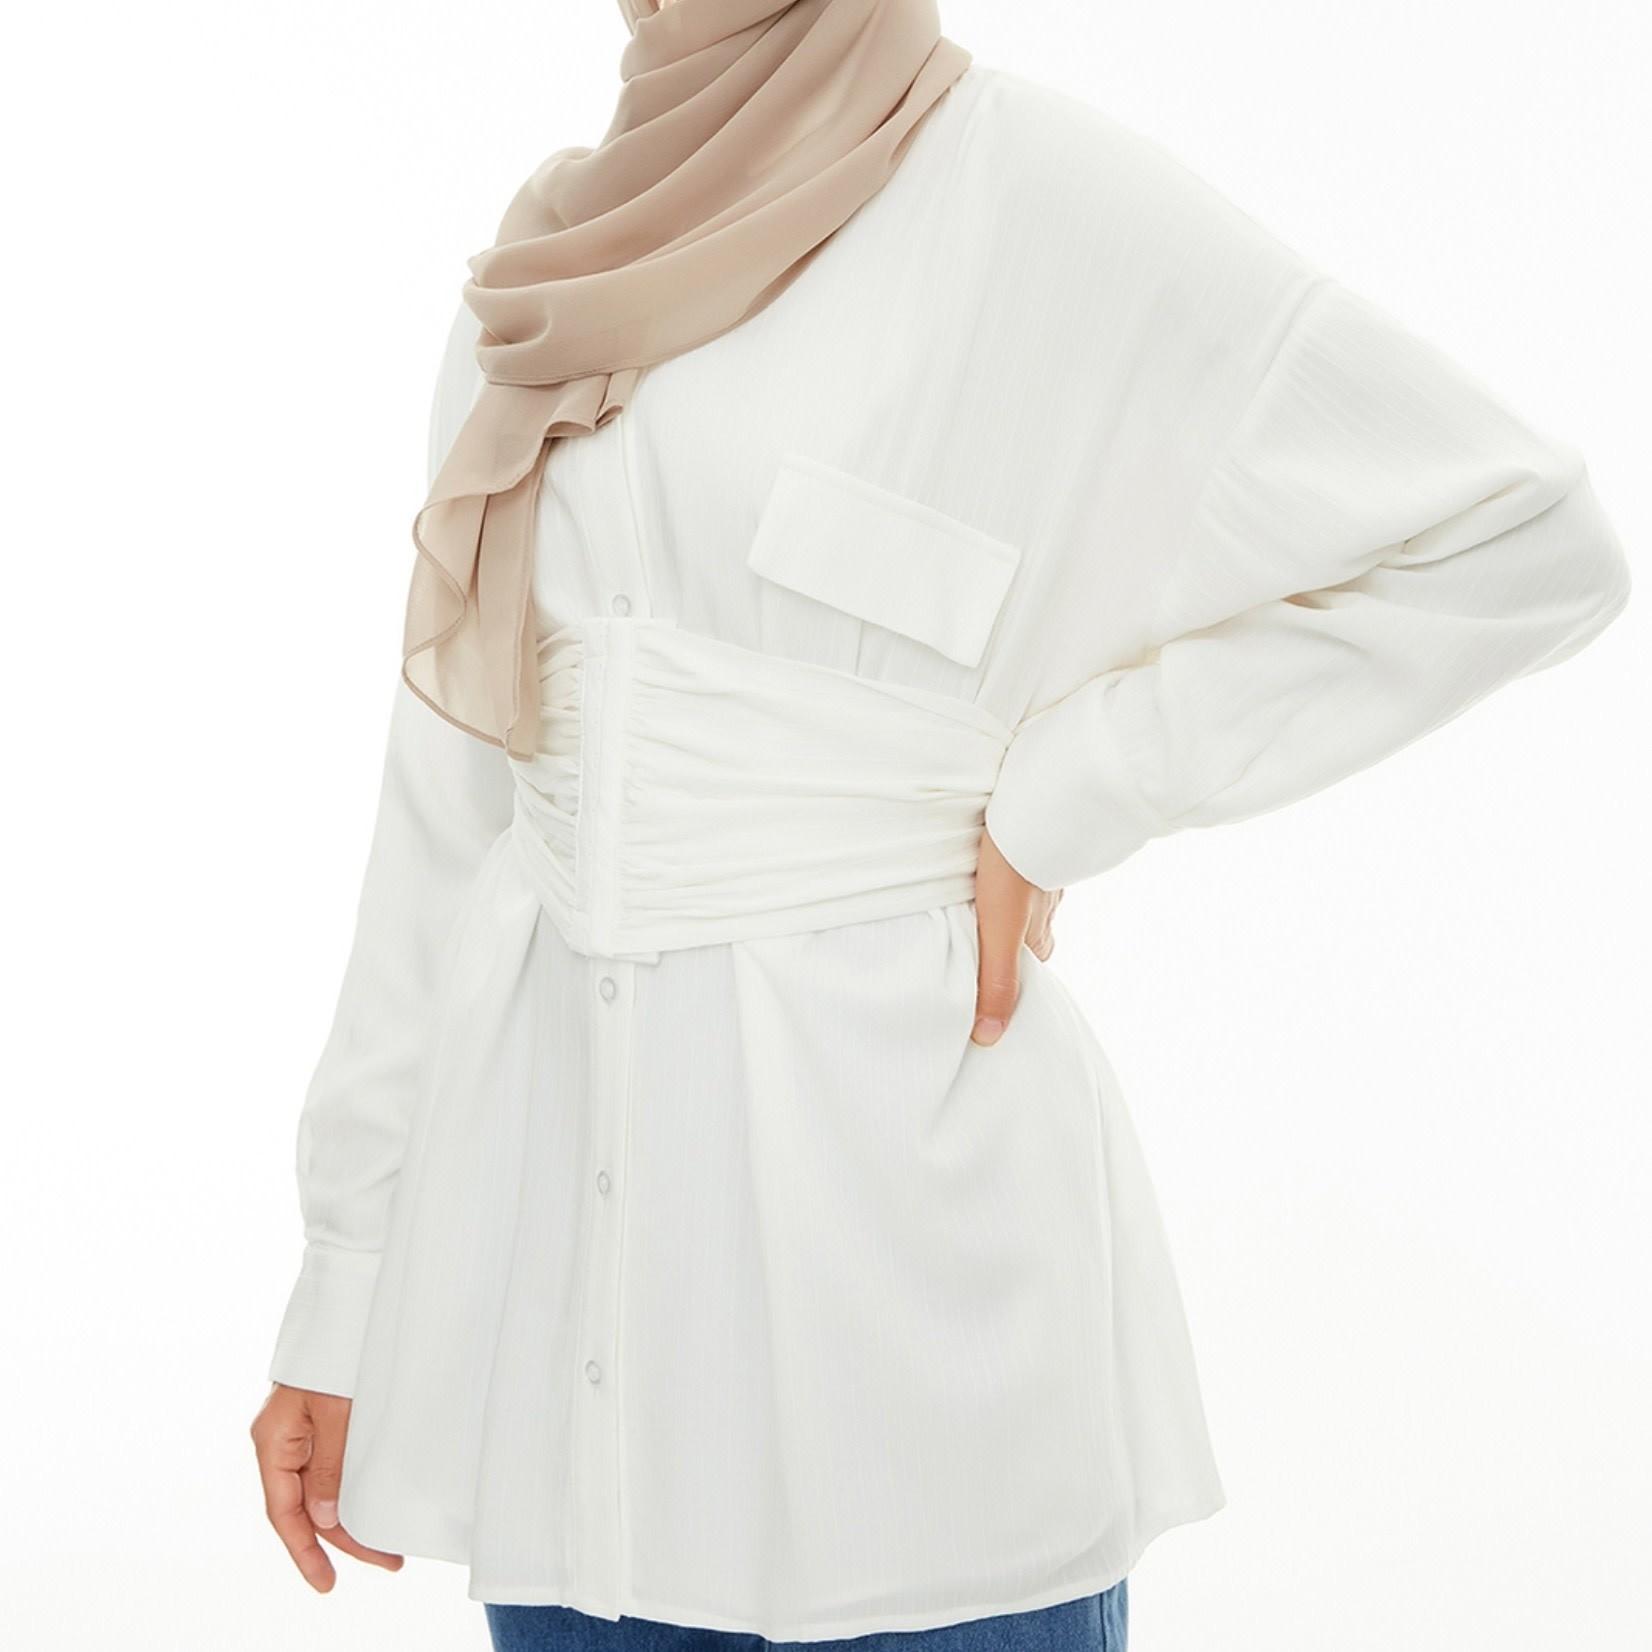 Hijab House Ambra Shirt